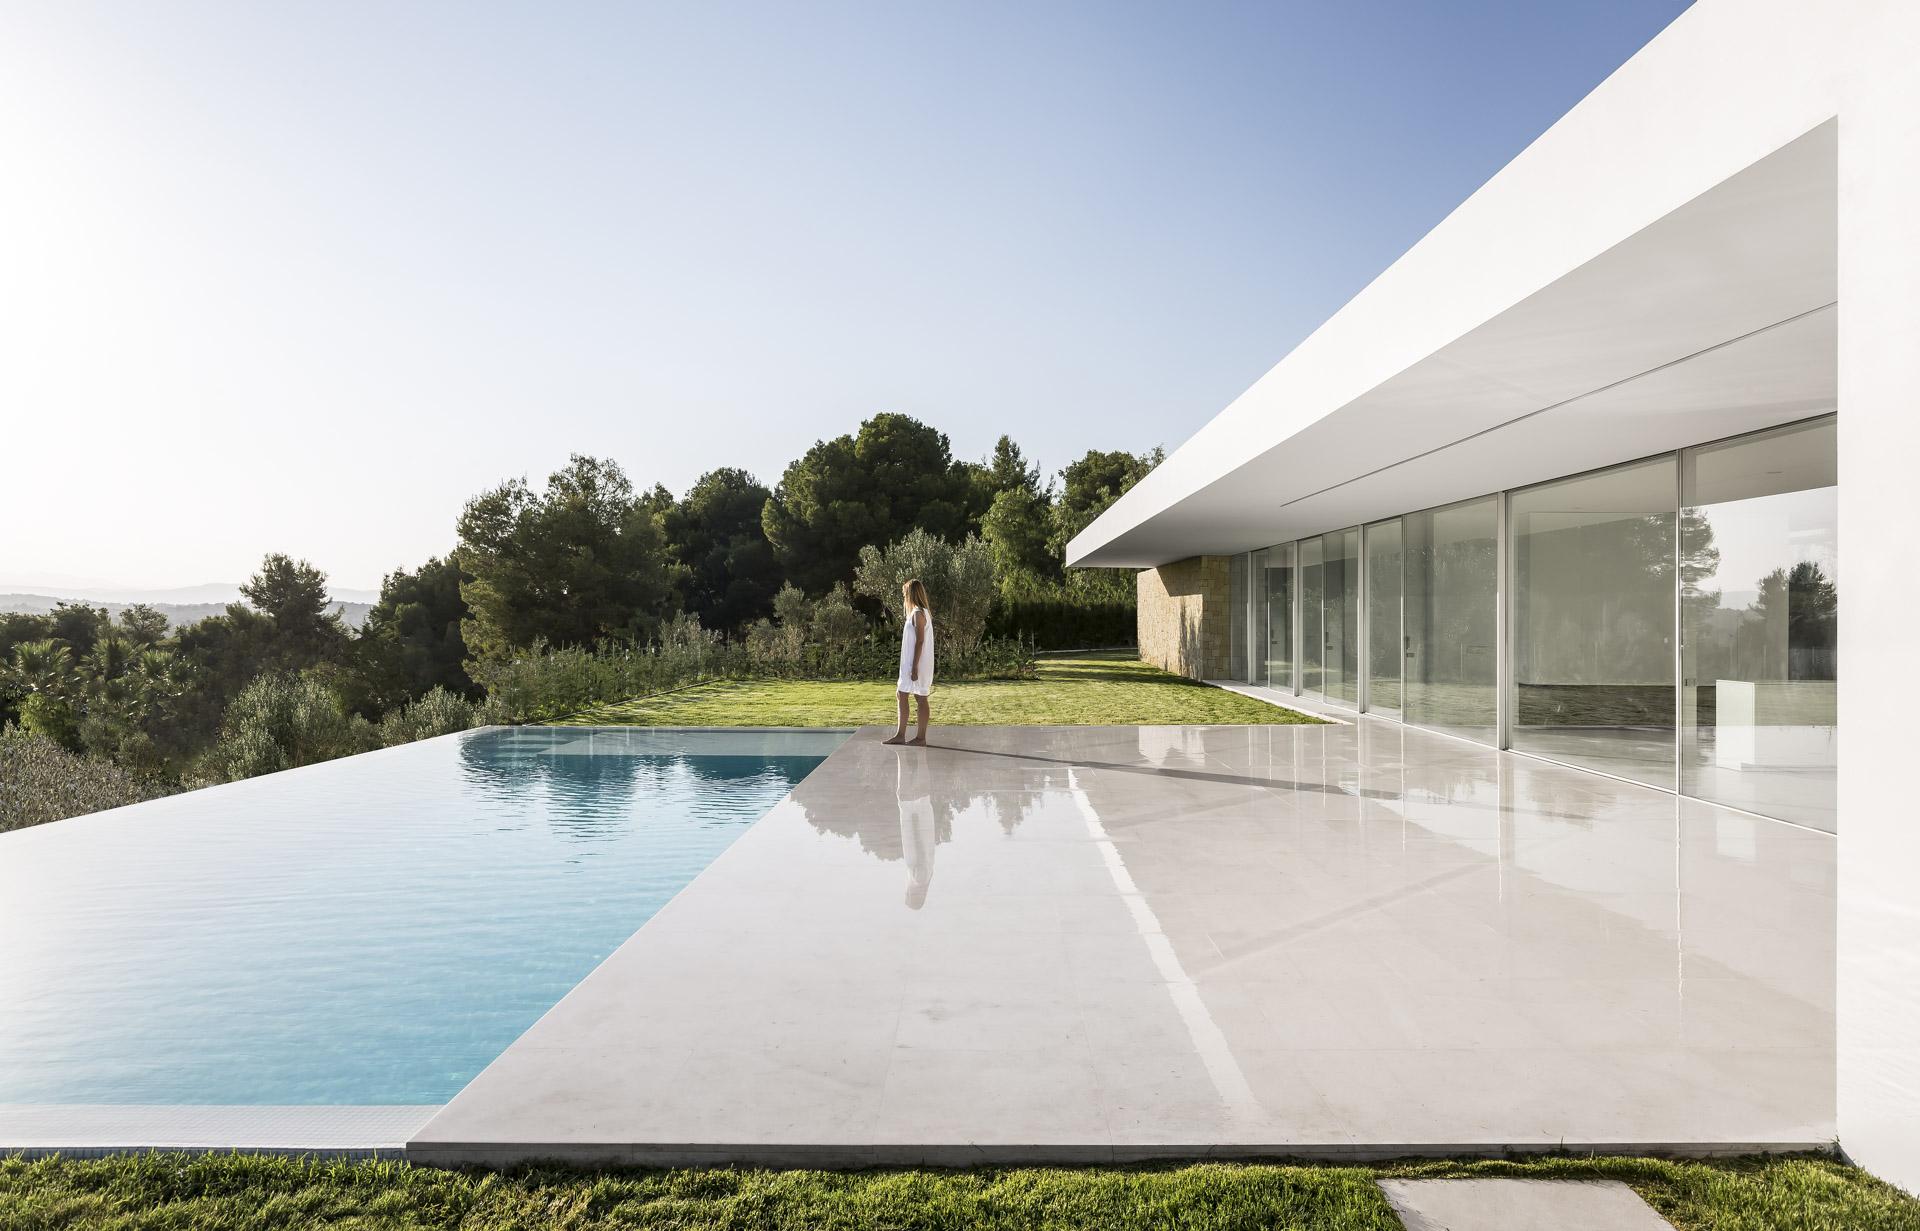 fotografia-arquitectura-valencia-german-cabo-gallardo-llopis-villamarchante-vivienda-38